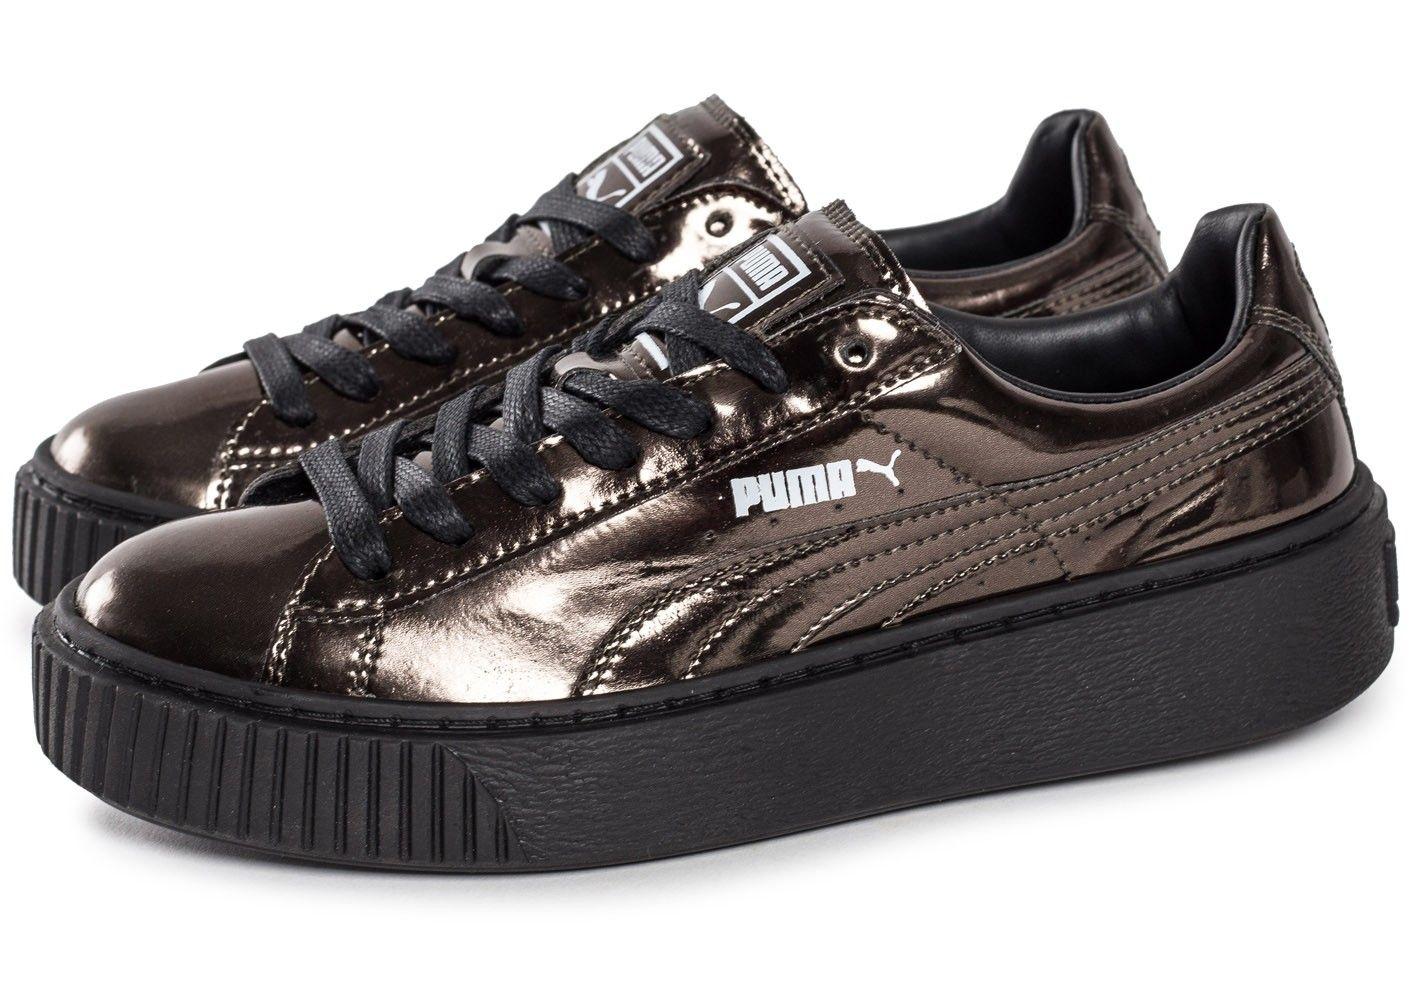 Chaussures Puma Basket Platform Metallic bronze vue extérieure ... 7a1cef8fa8